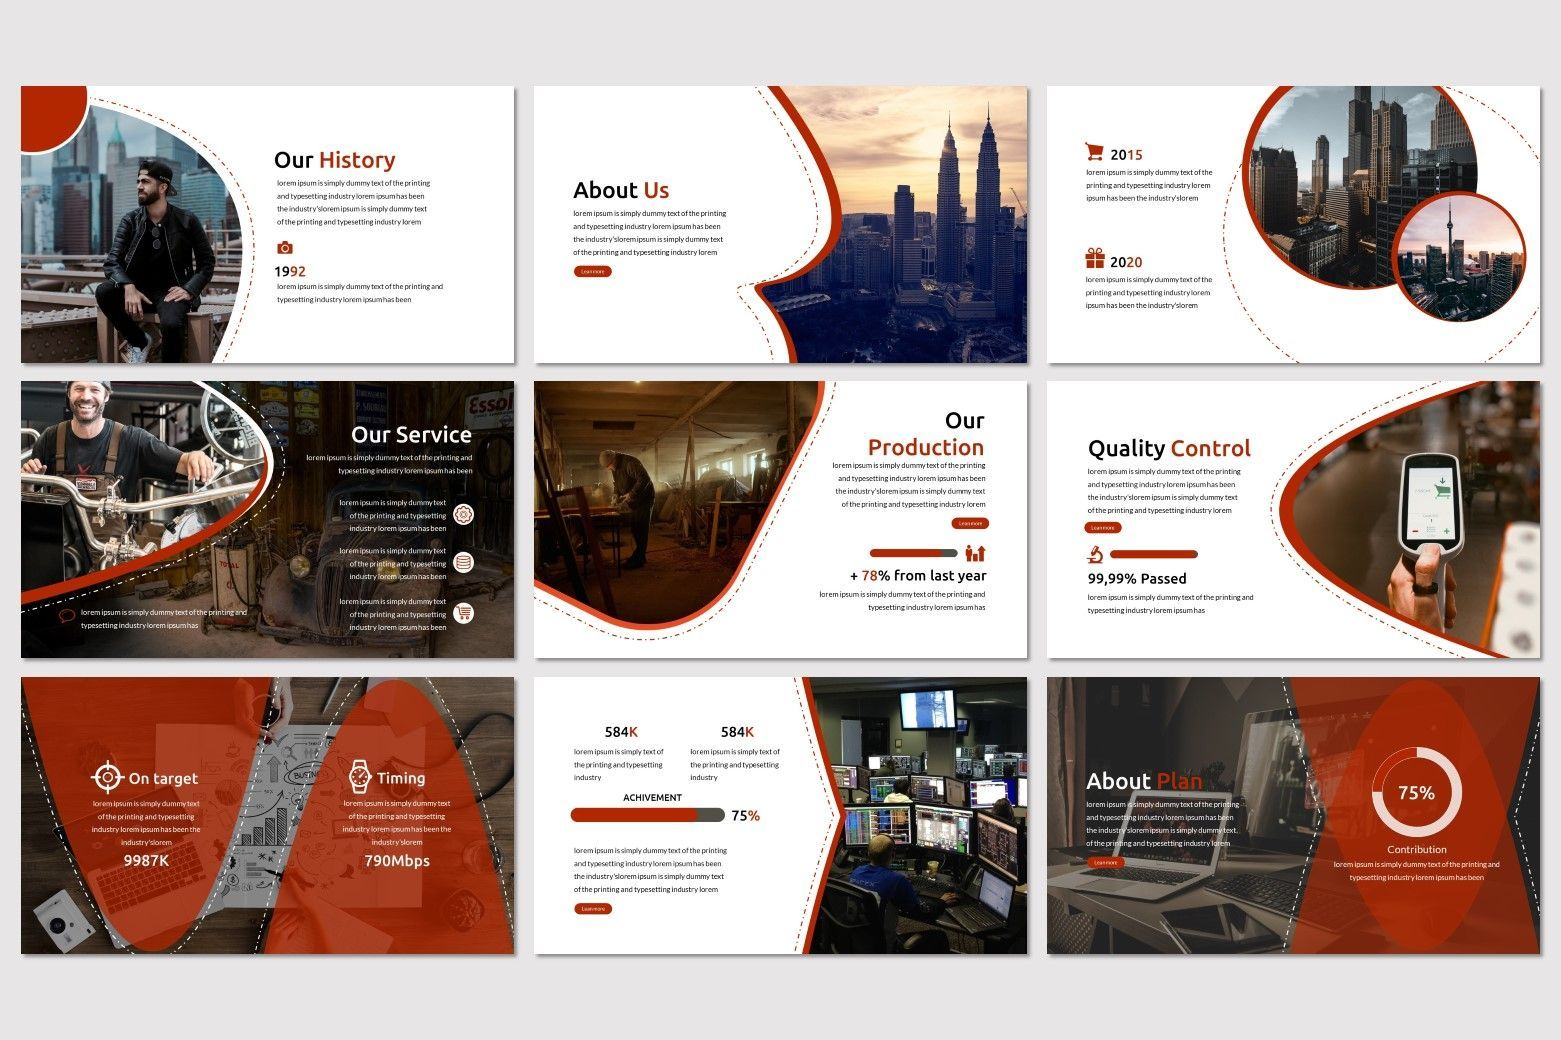 Alfath - PowerPoint Template, Slide 3, 07592, Presentation Templates — PoweredTemplate.com